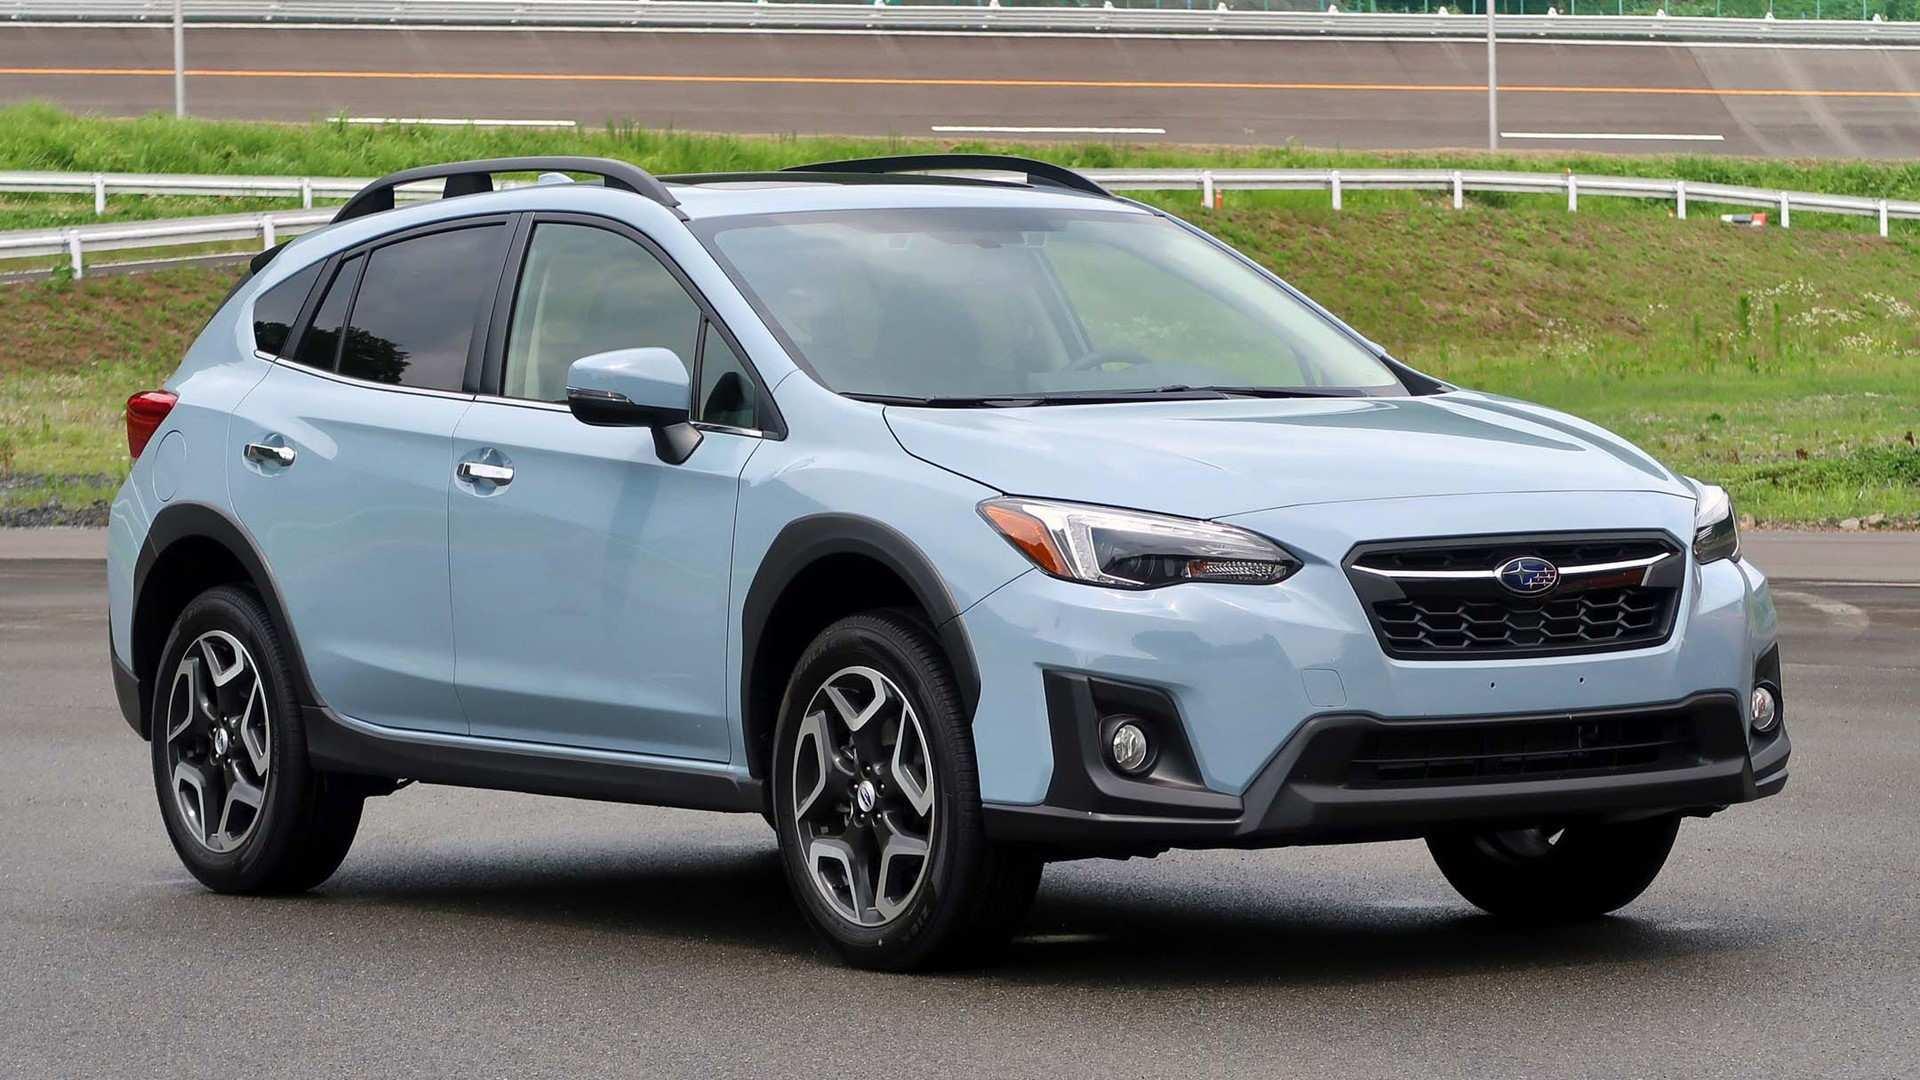 45 All New Subaru 2019 Crosstrek Hybrid Price And Release Date Picture by Subaru 2019 Crosstrek Hybrid Price And Release Date